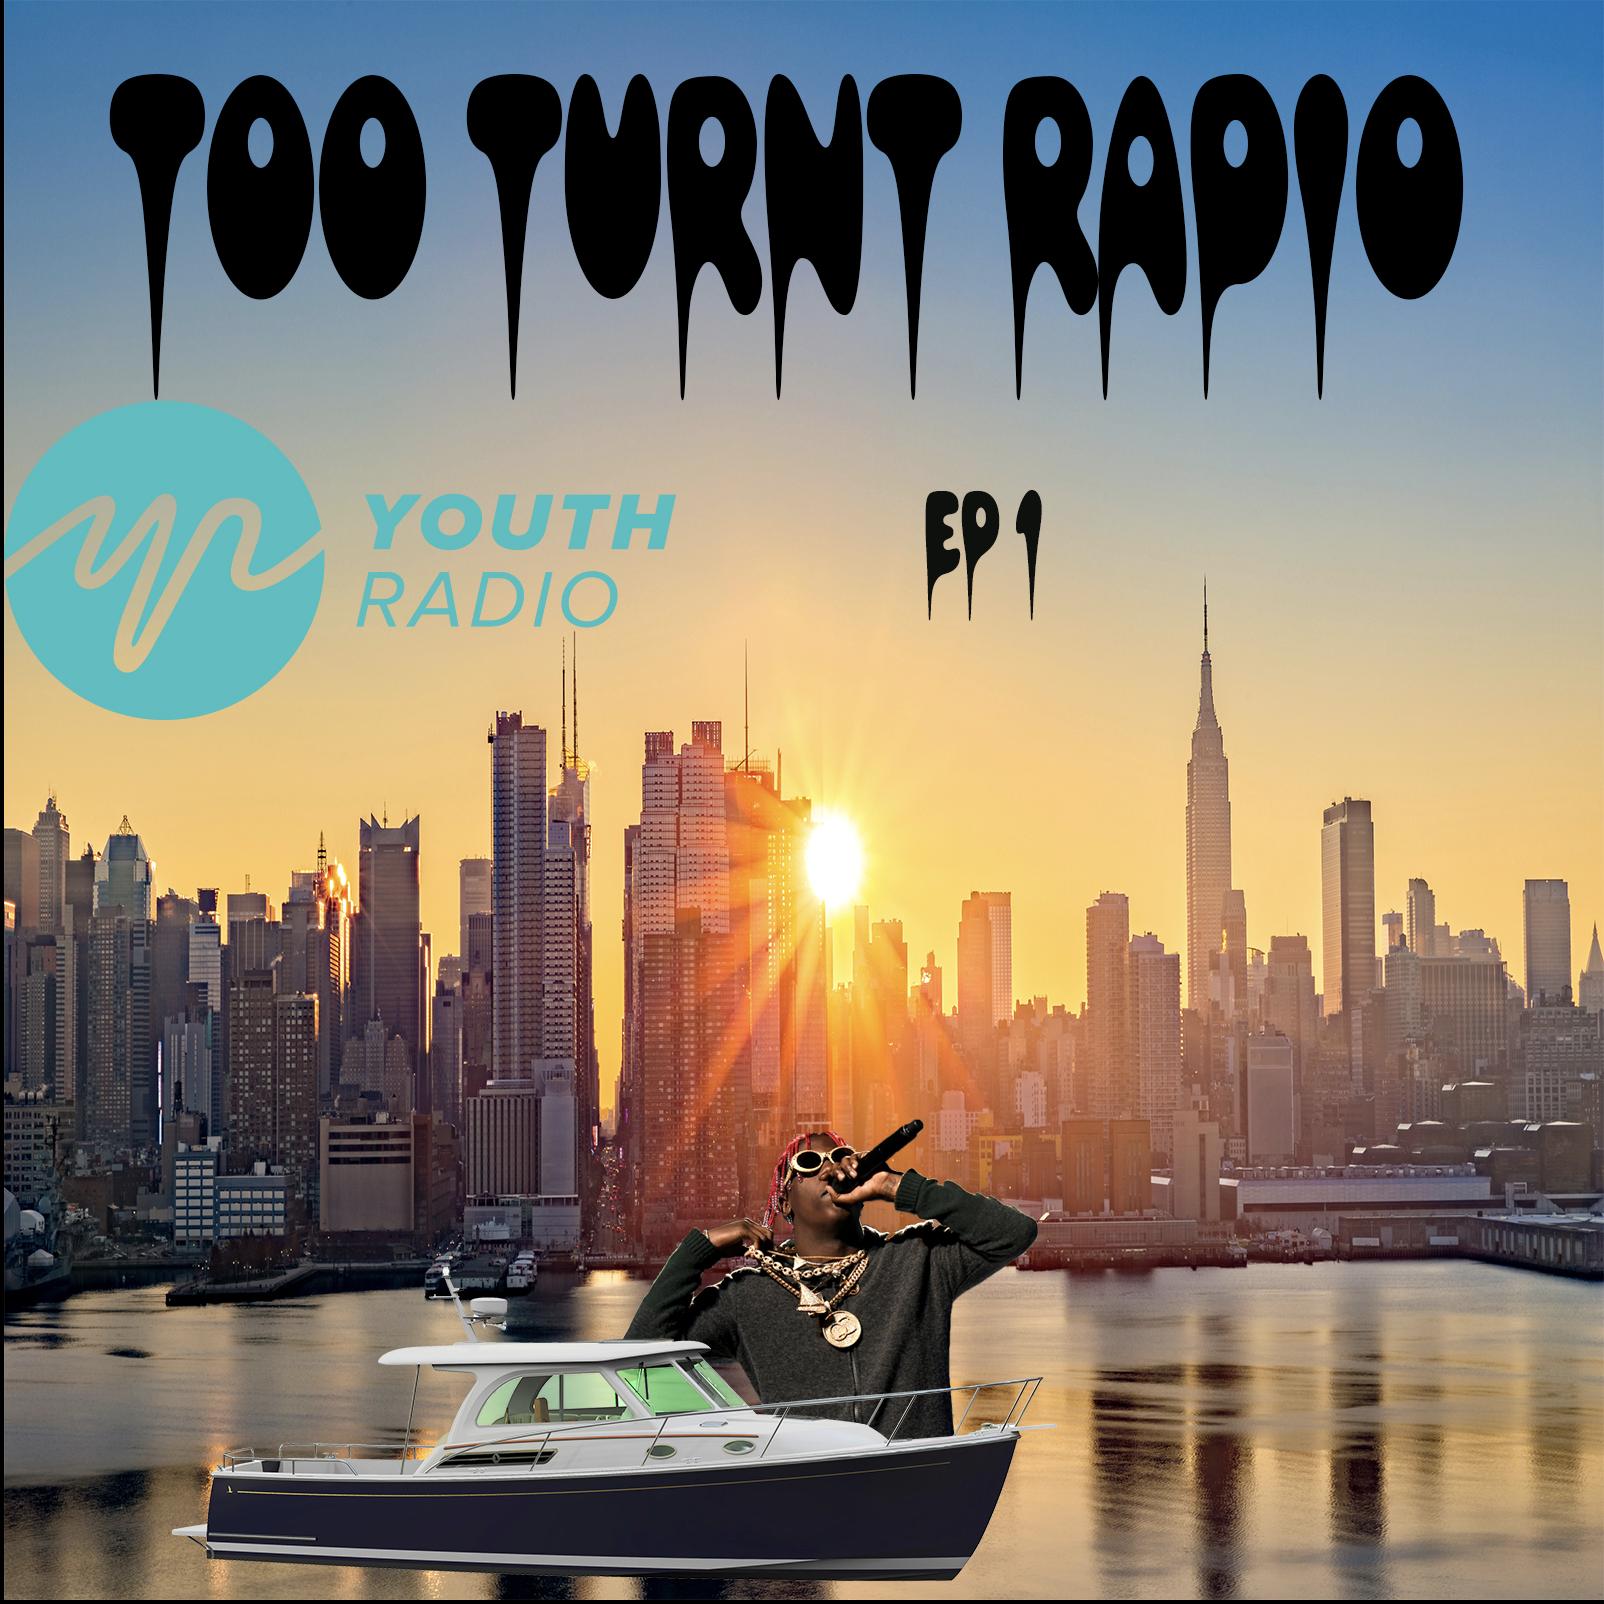 Youth Radio Raw: Too Turnt Radio Episode 1